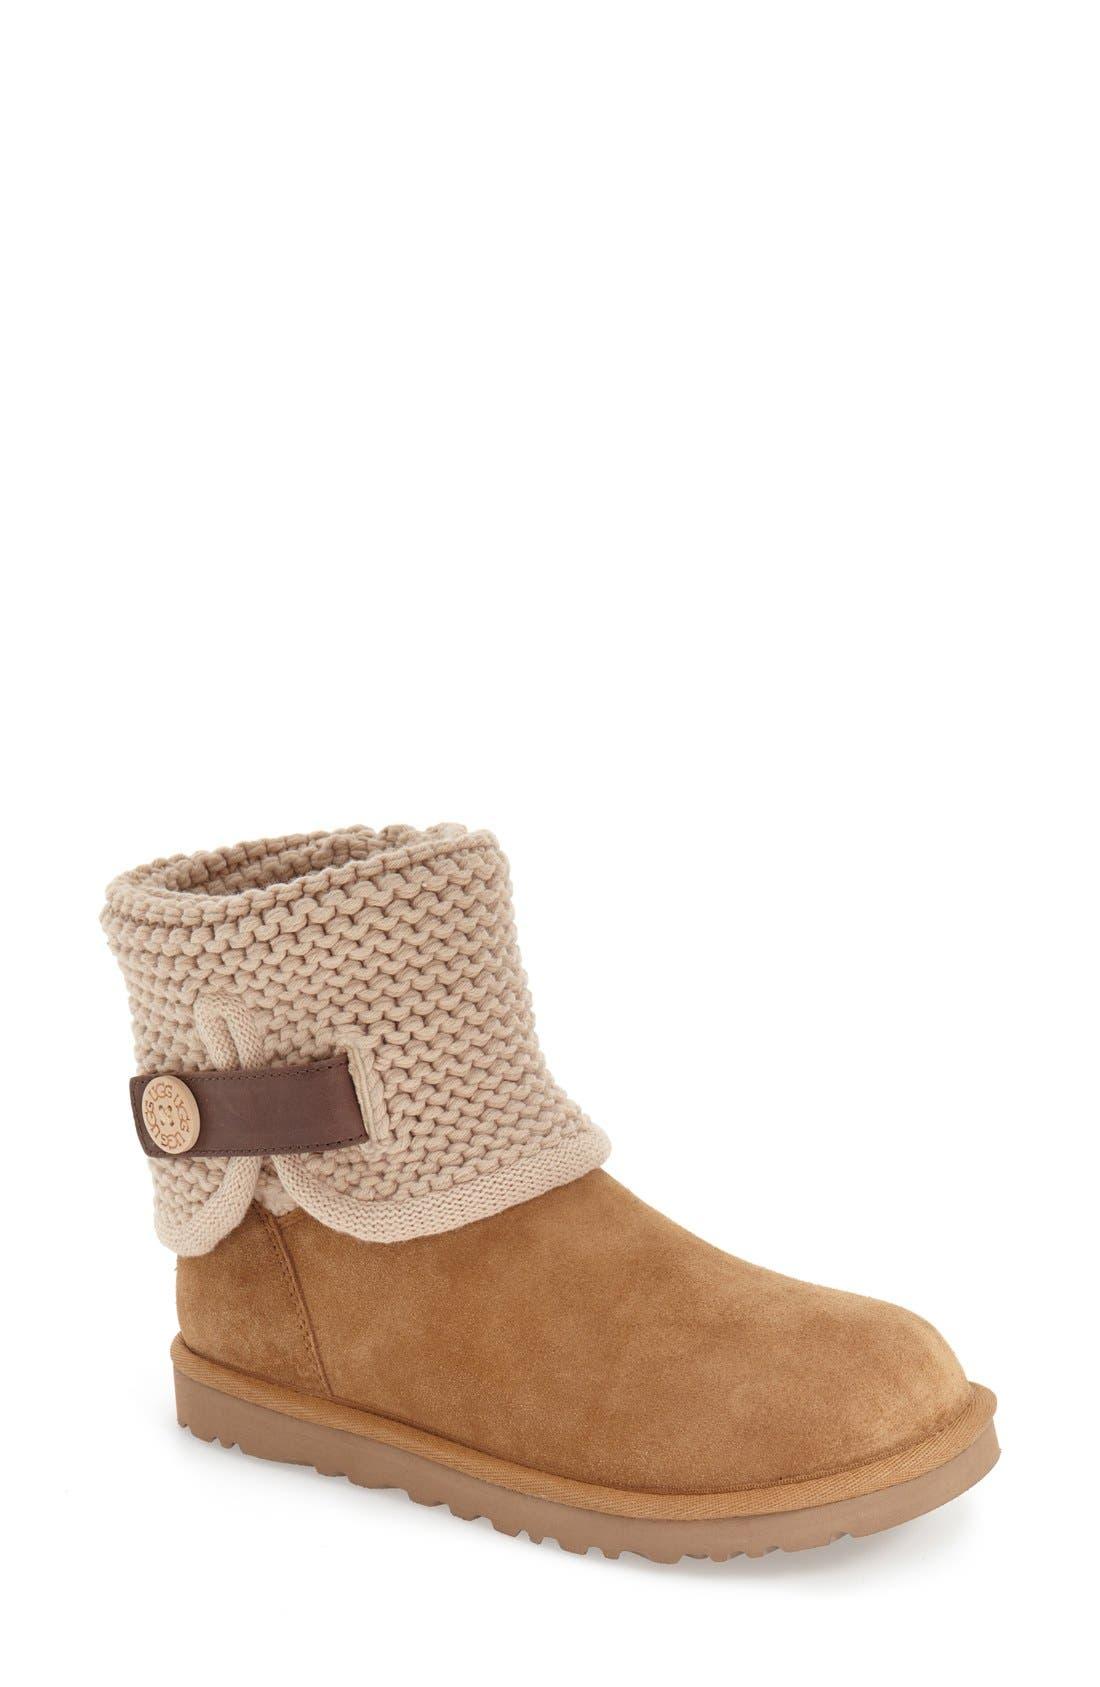 UGG<SUP>®</SUP> Shaina Knit Cuff Bootie